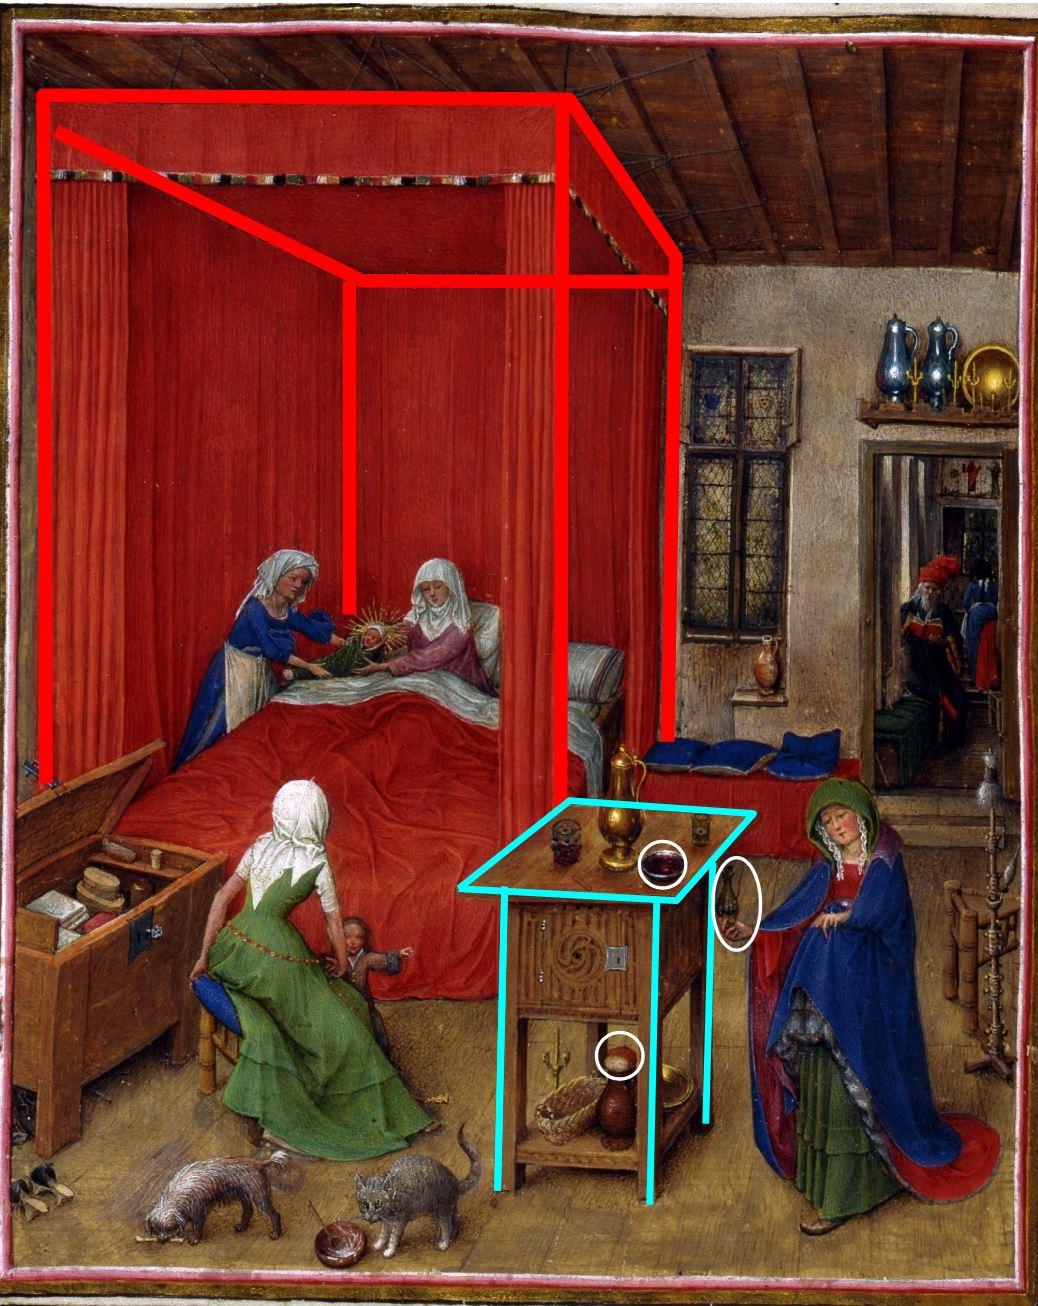 Naissance de Saint Jean Baptiste, fol. 93v, from the Turin-Milan Hours, ca. 1445–52. Turin schema